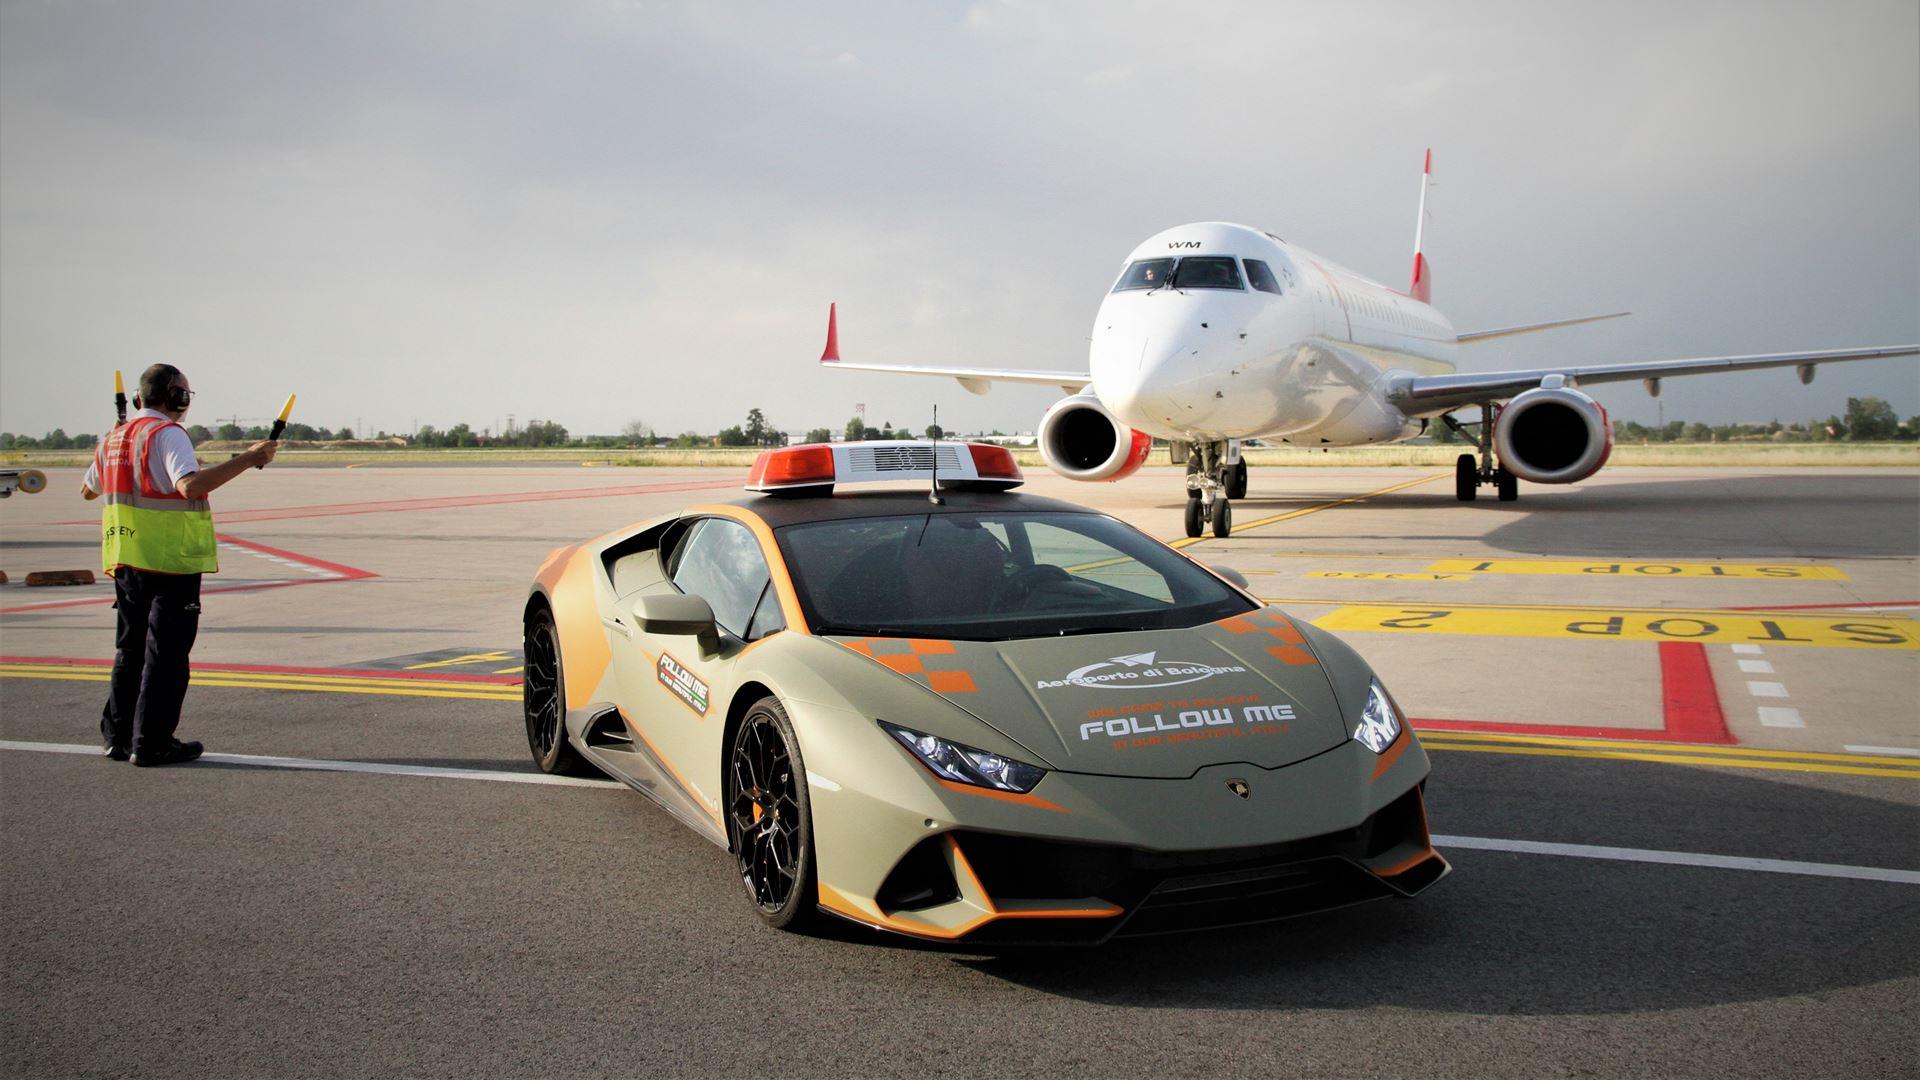 A new Lamborghini Huracán EVO follow-me car for Bologna Airport - Image 7